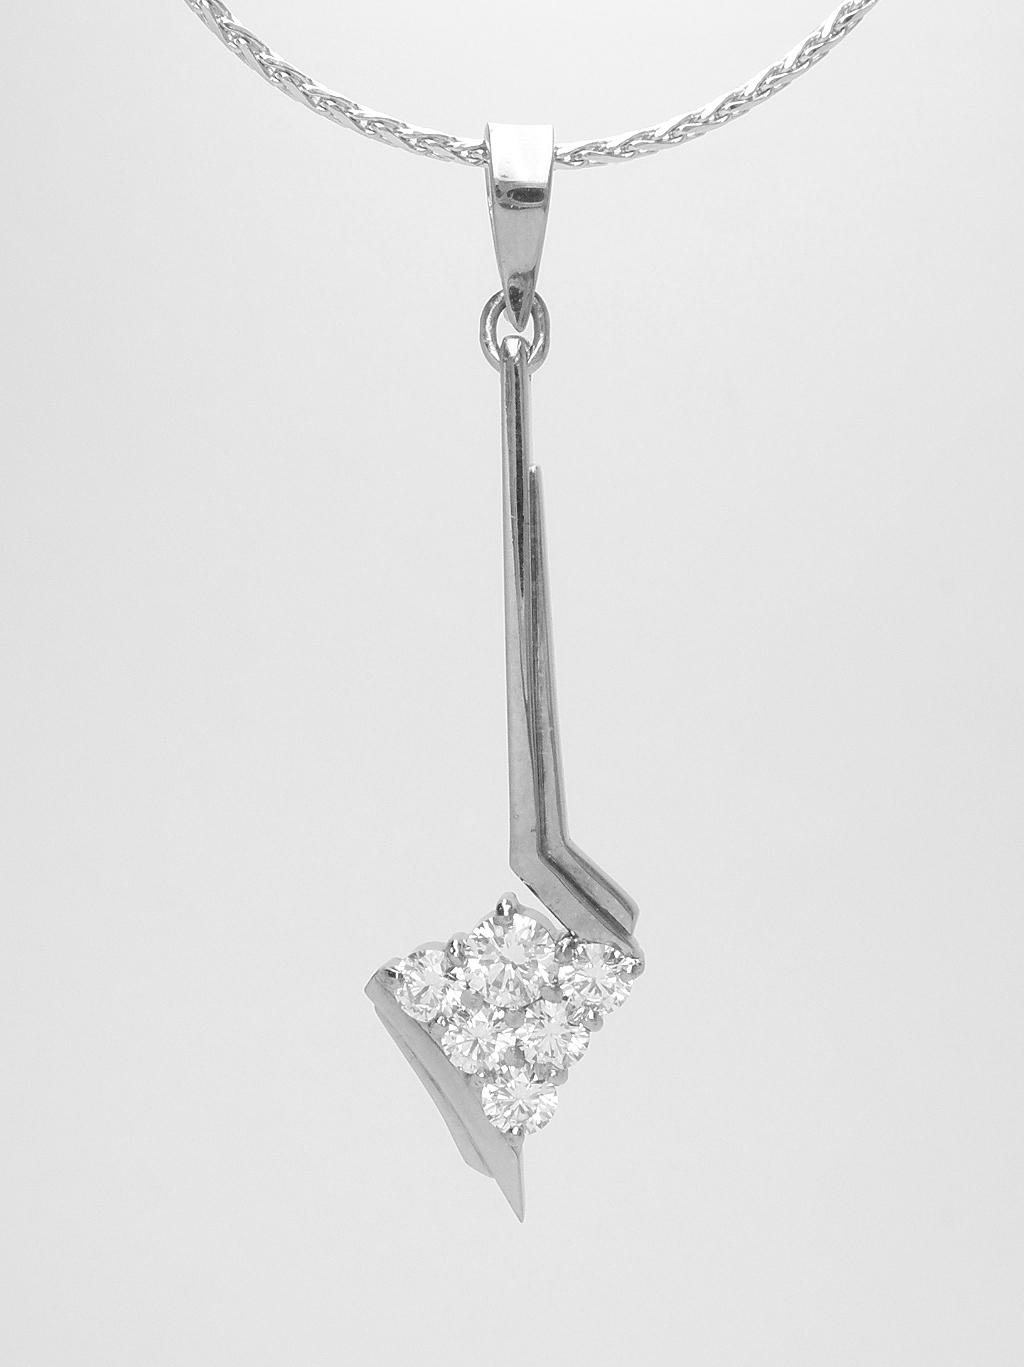 18ct. white gold 6 stone round brilliant cut diamond 'V' shaped cluster, pendulum style pendant.